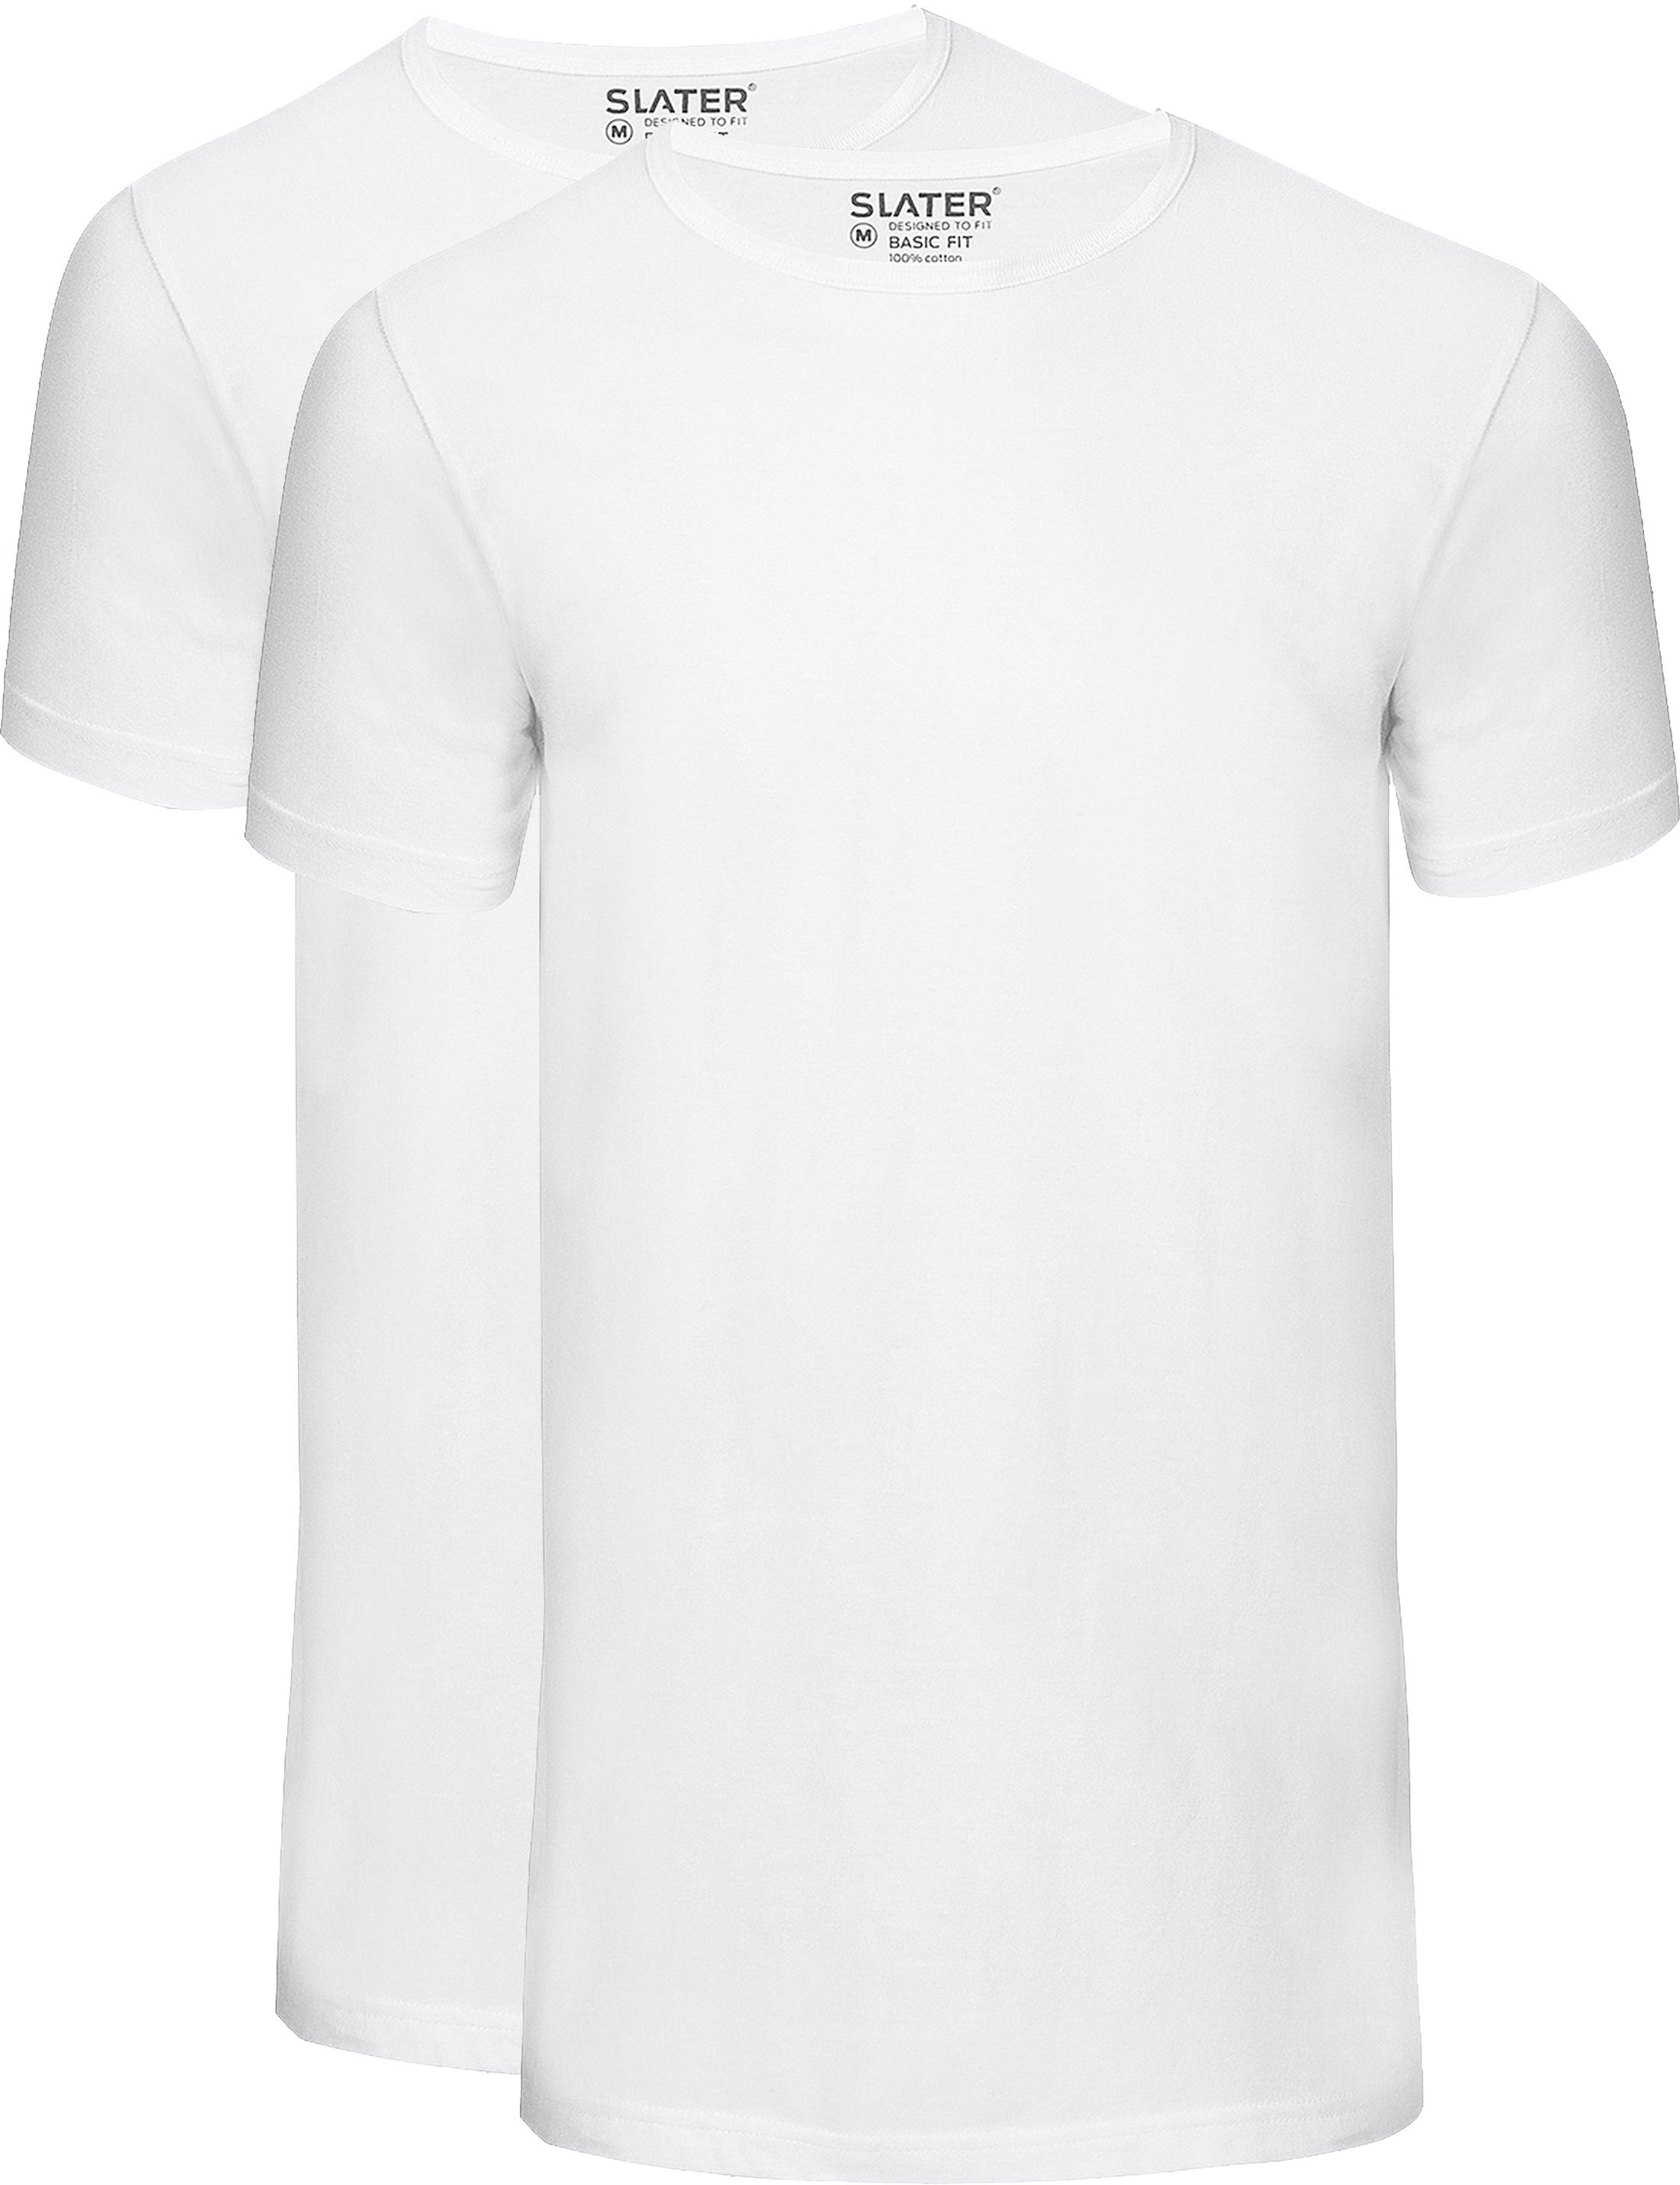 Slater 2-pack Basic Fit T-shirt Wit foto 0